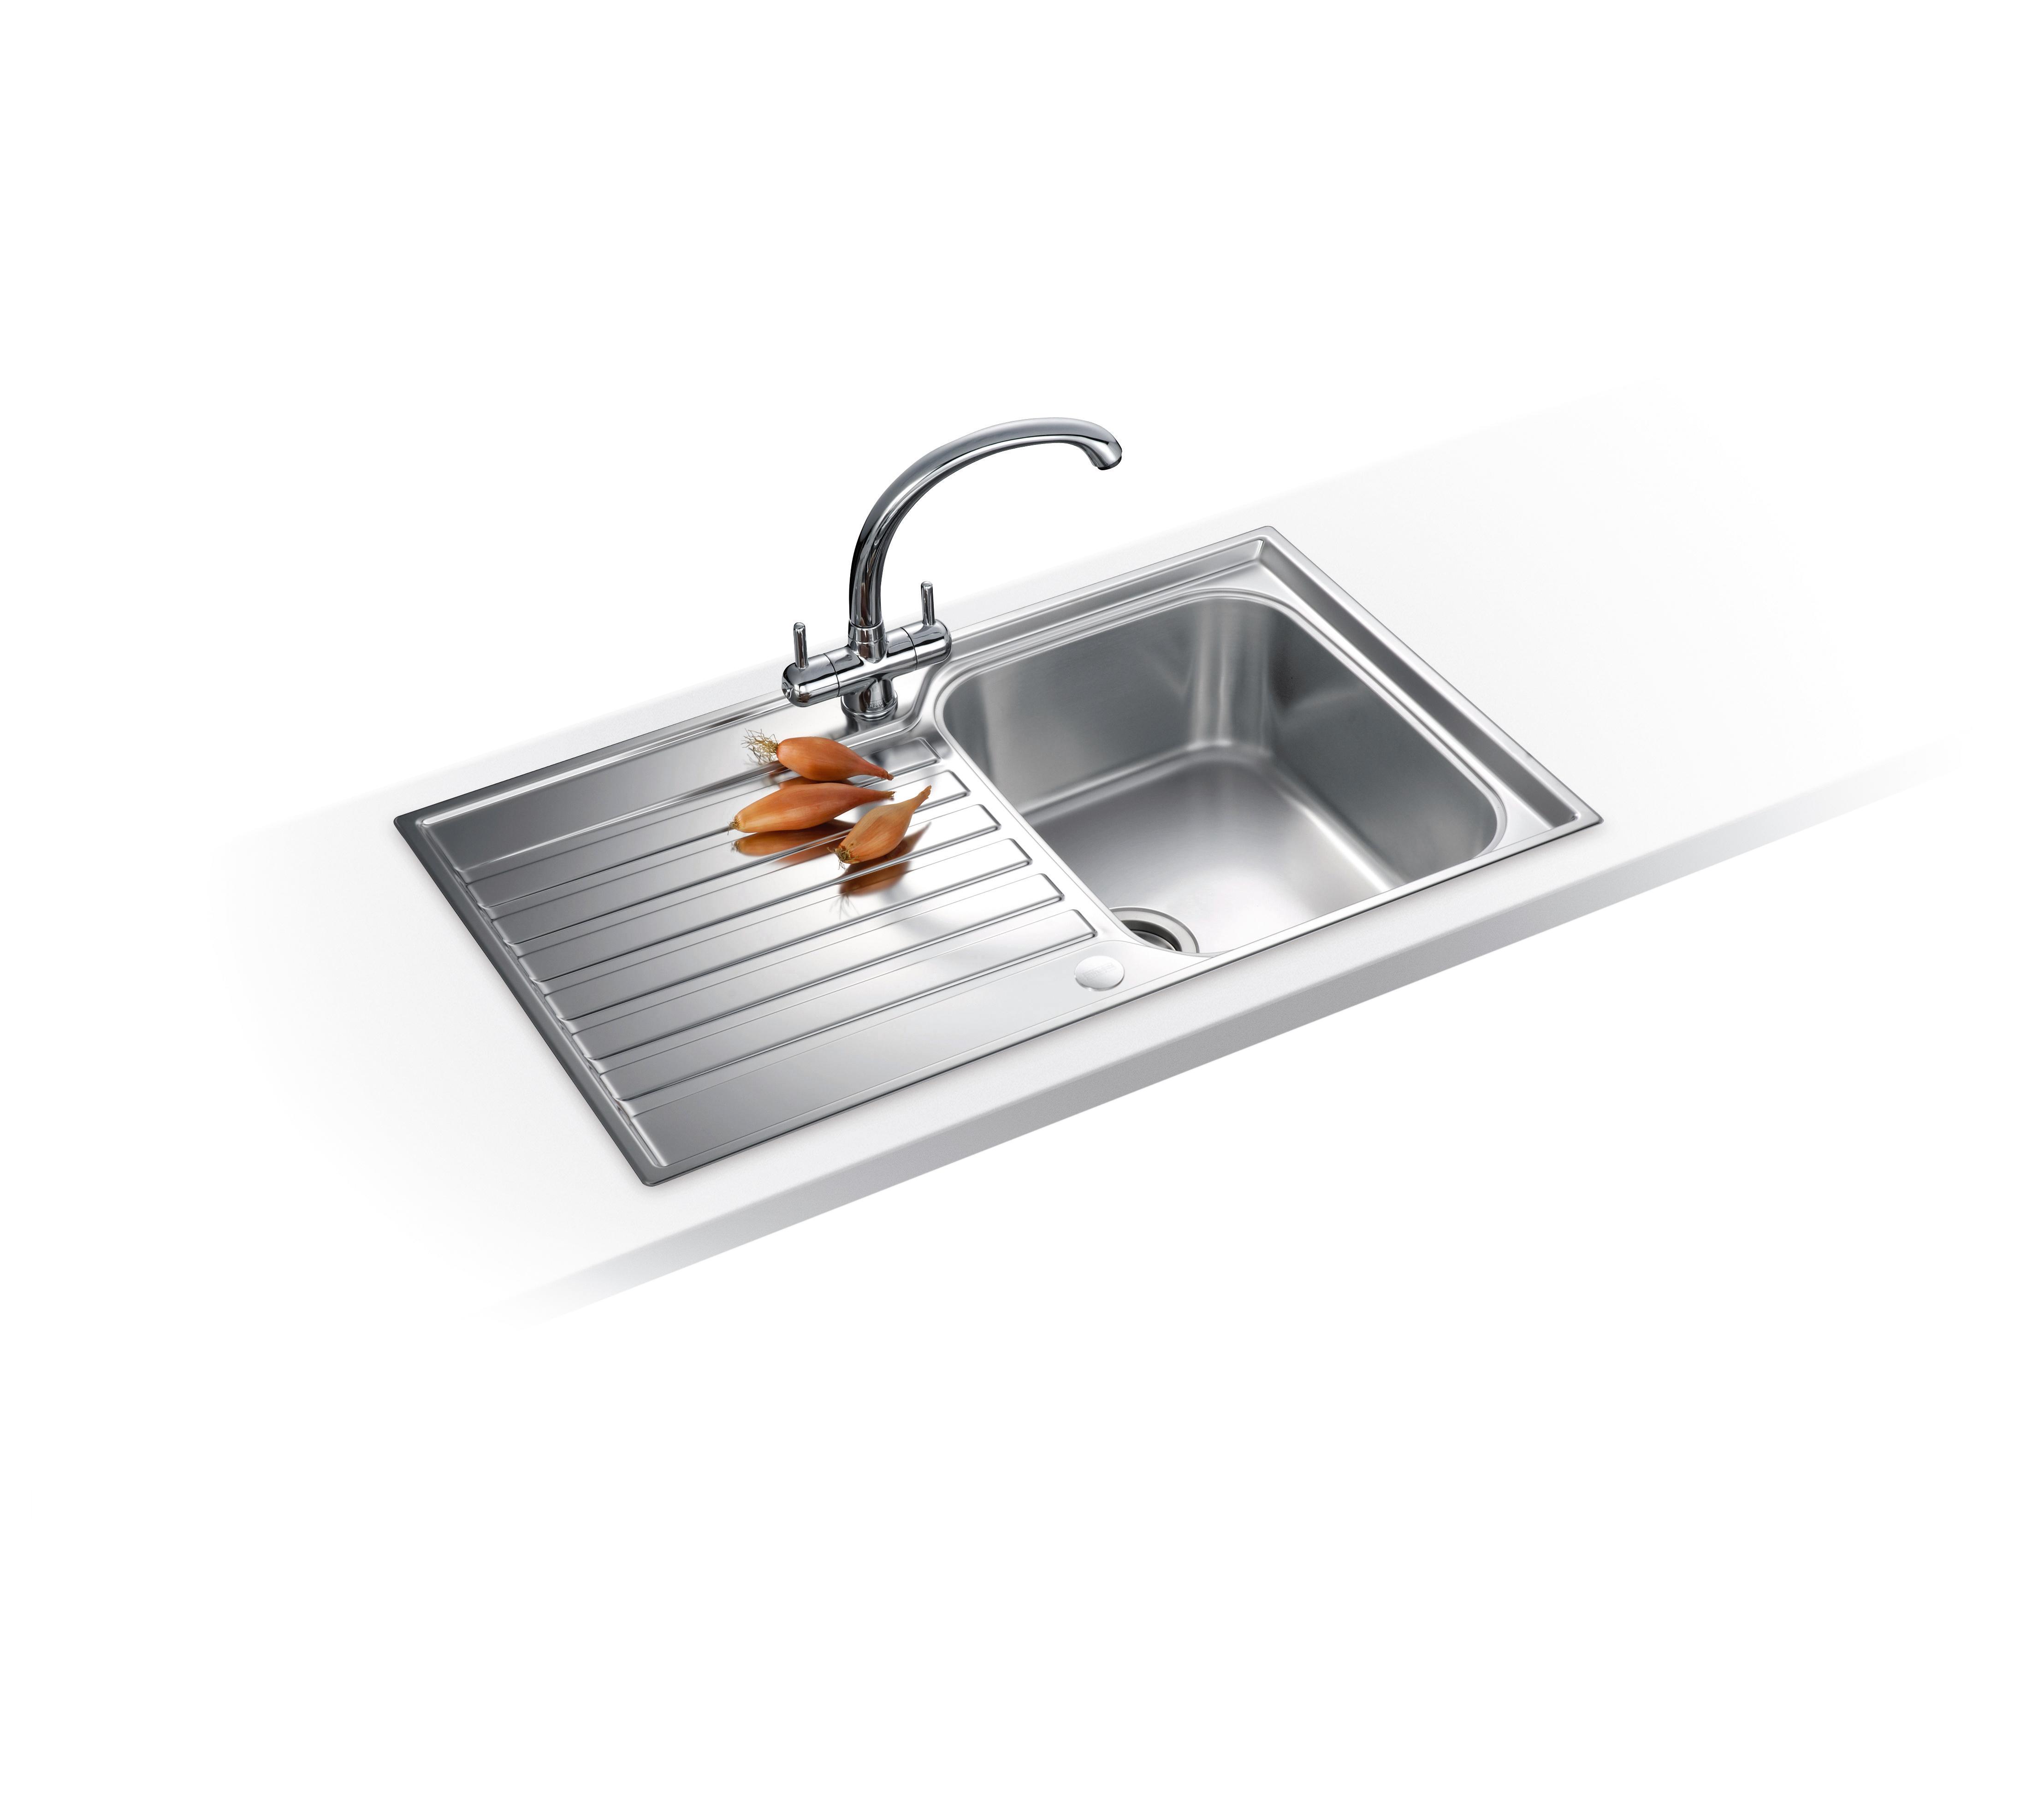 Fitting Franke Sink : Franke Ascona 1.0 Bowl Silk Stainless Steel Kitchen Sink ASX611 Sink ...